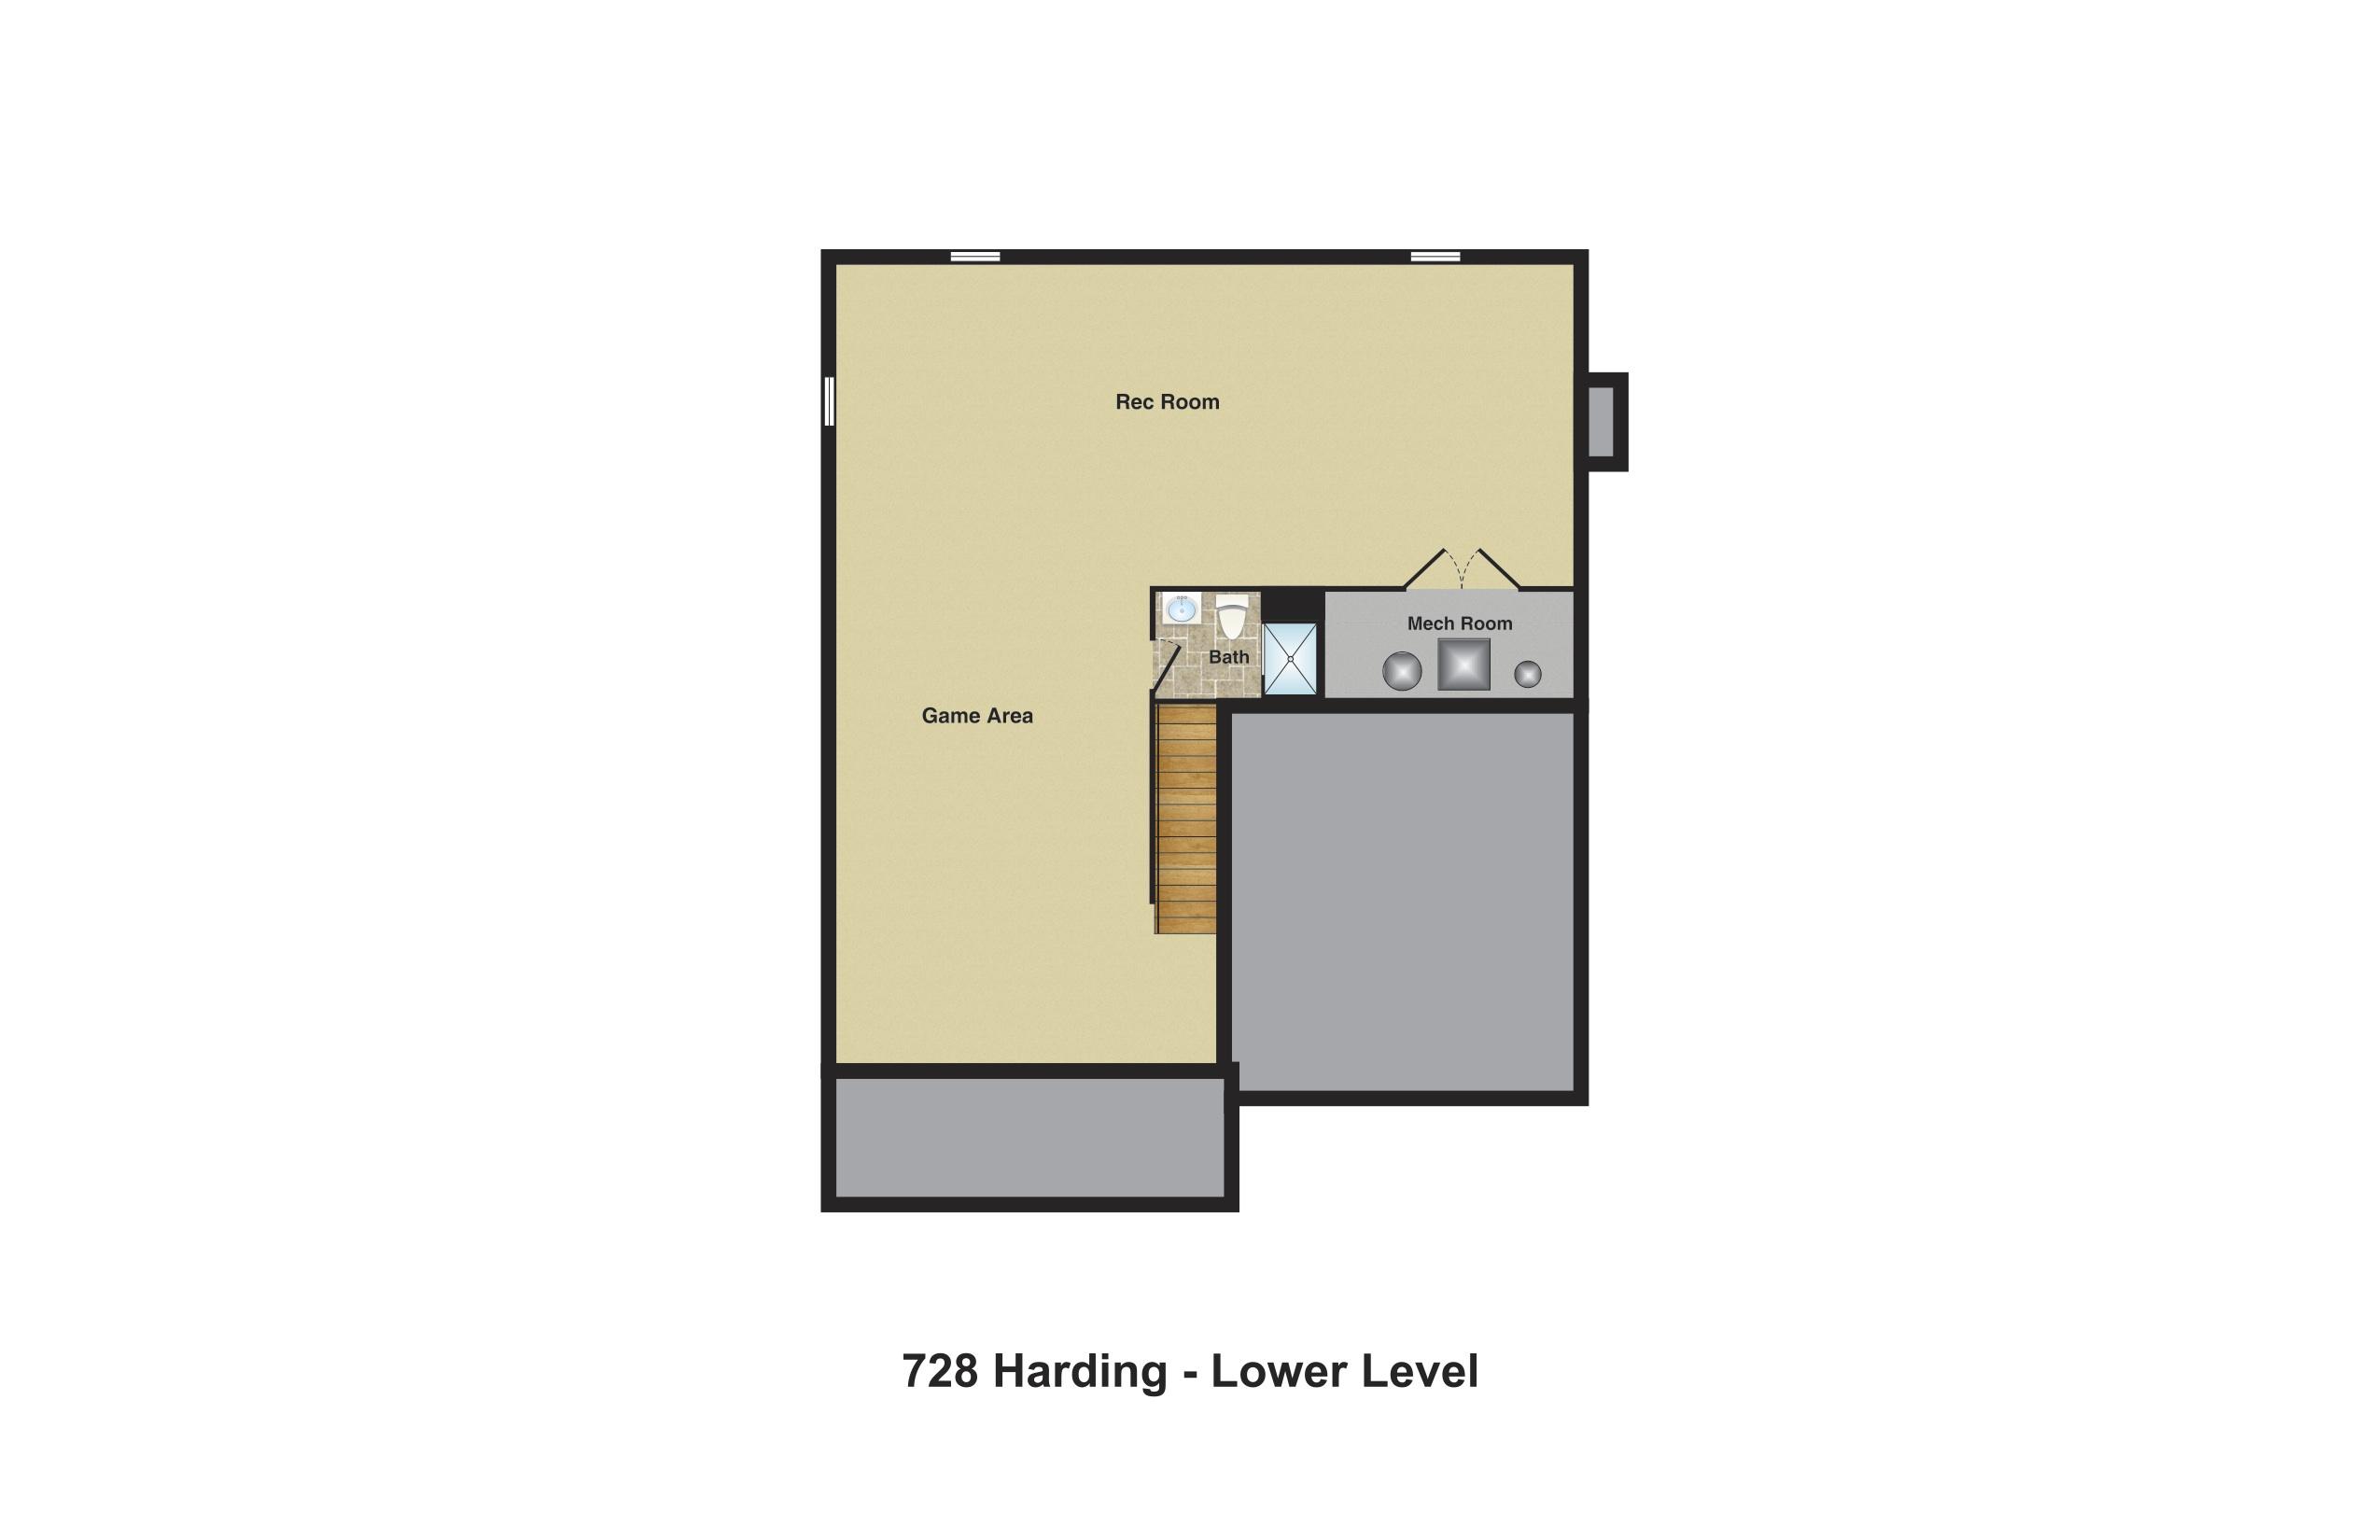 728 Harding basement